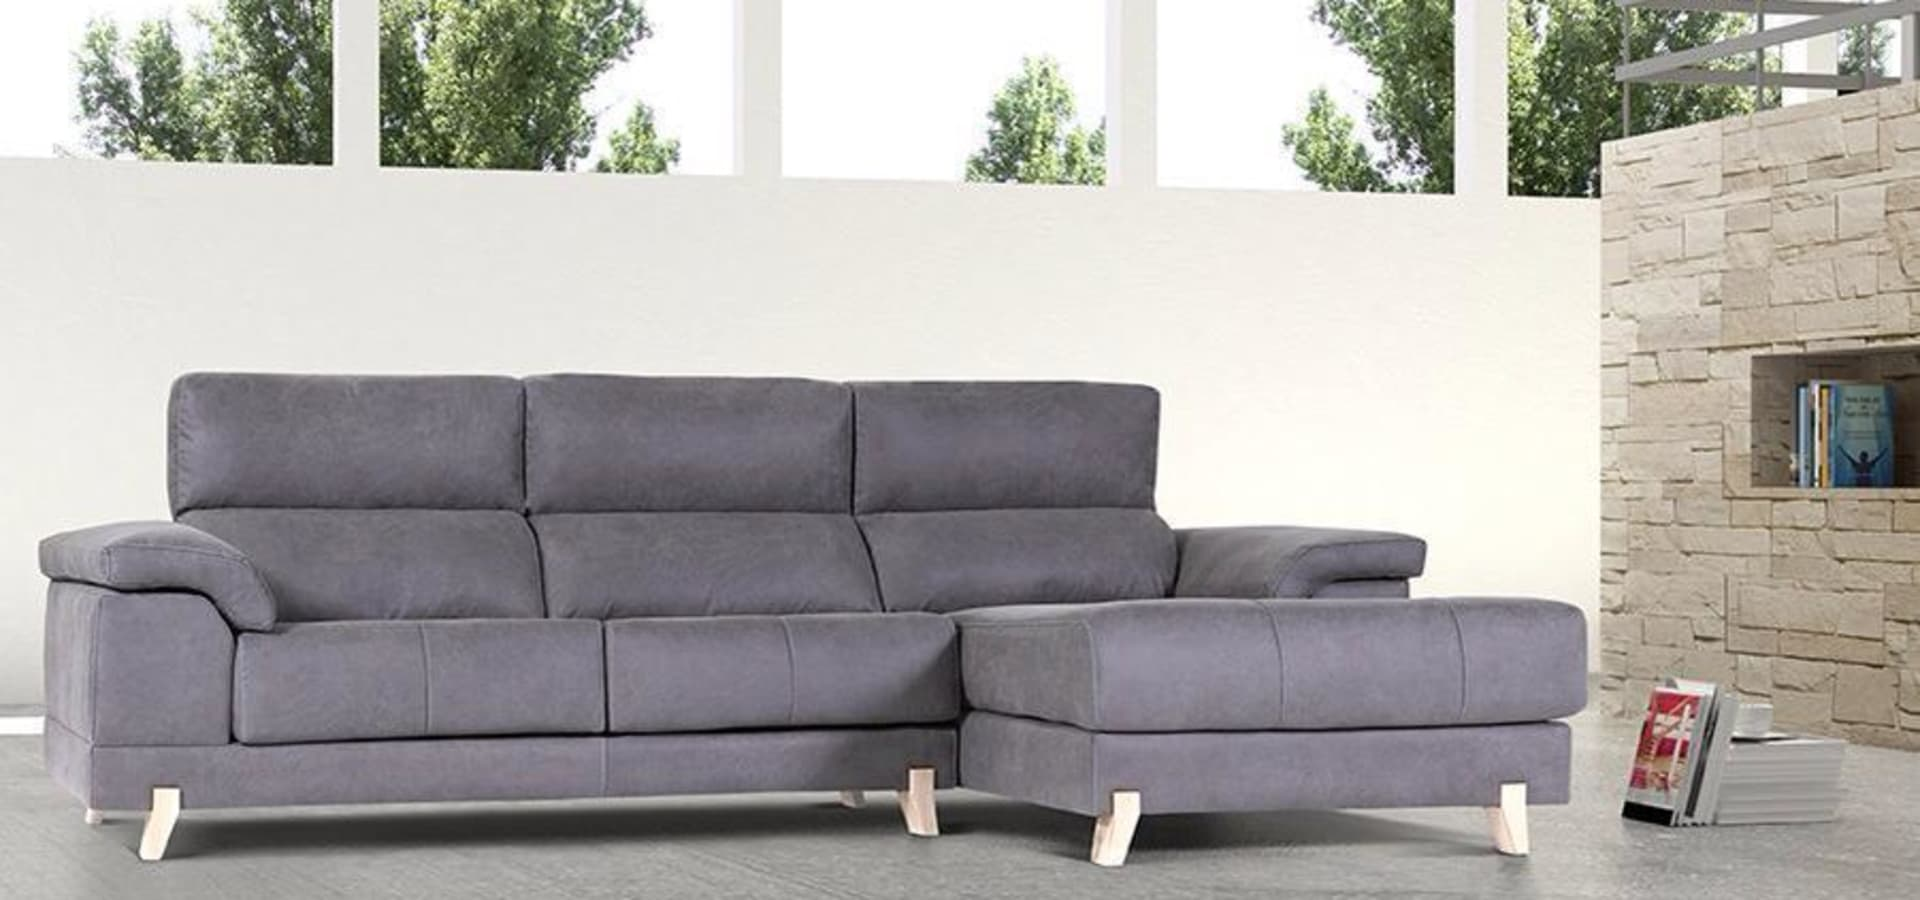 Sof s cama sof s butacas y sillones relax por dekape for Sofas y sillones relax